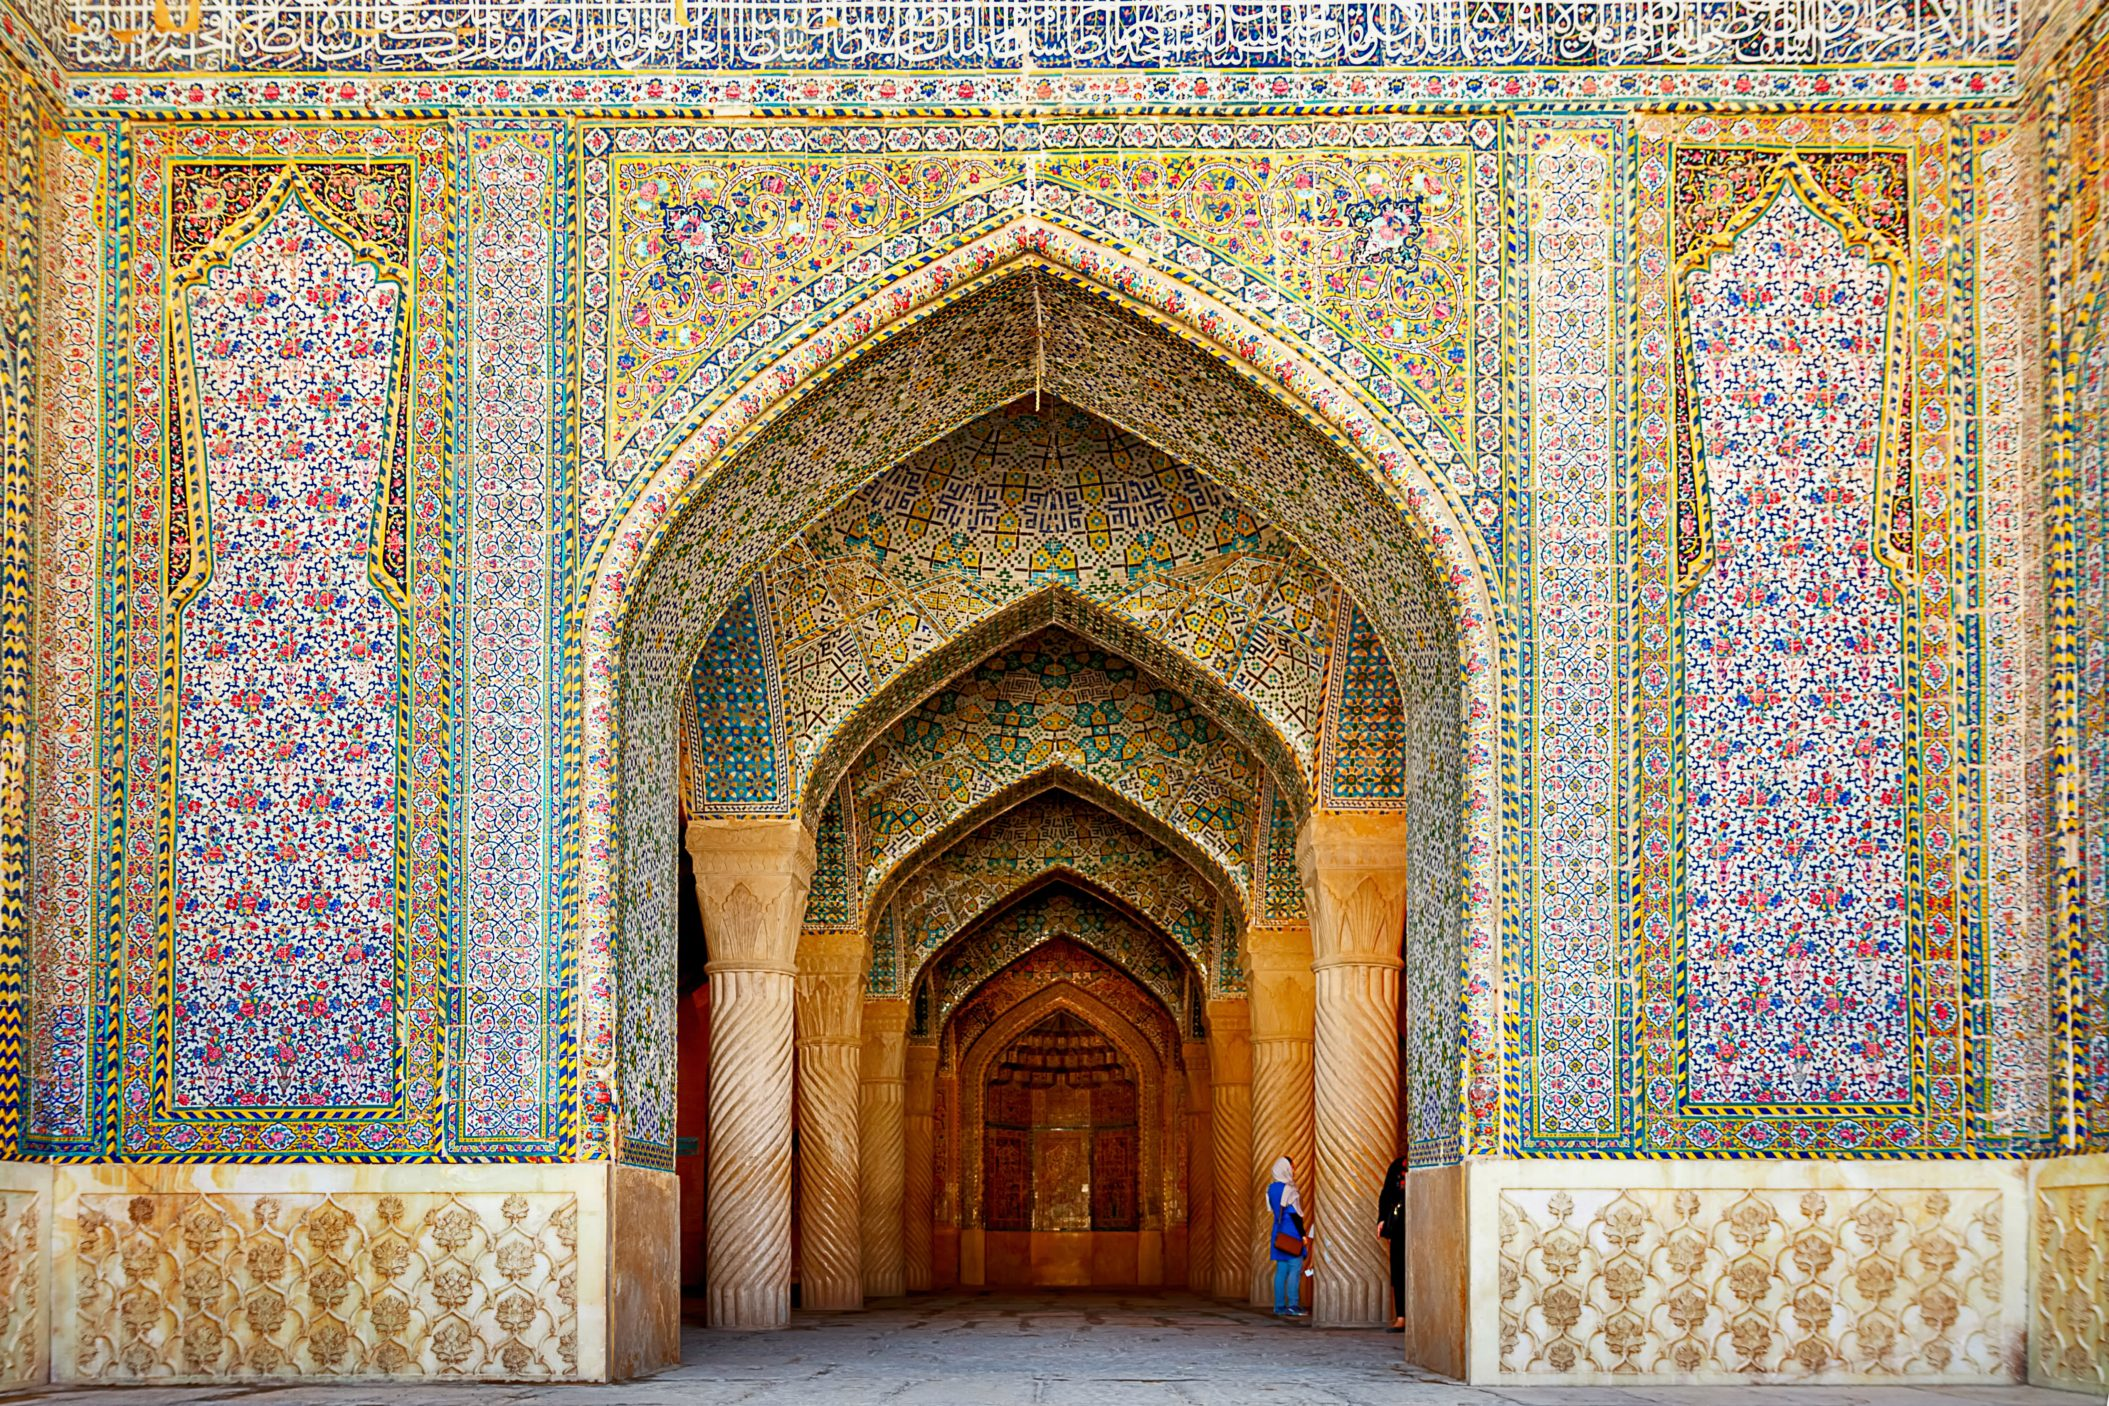 Iran [Shutterstock]